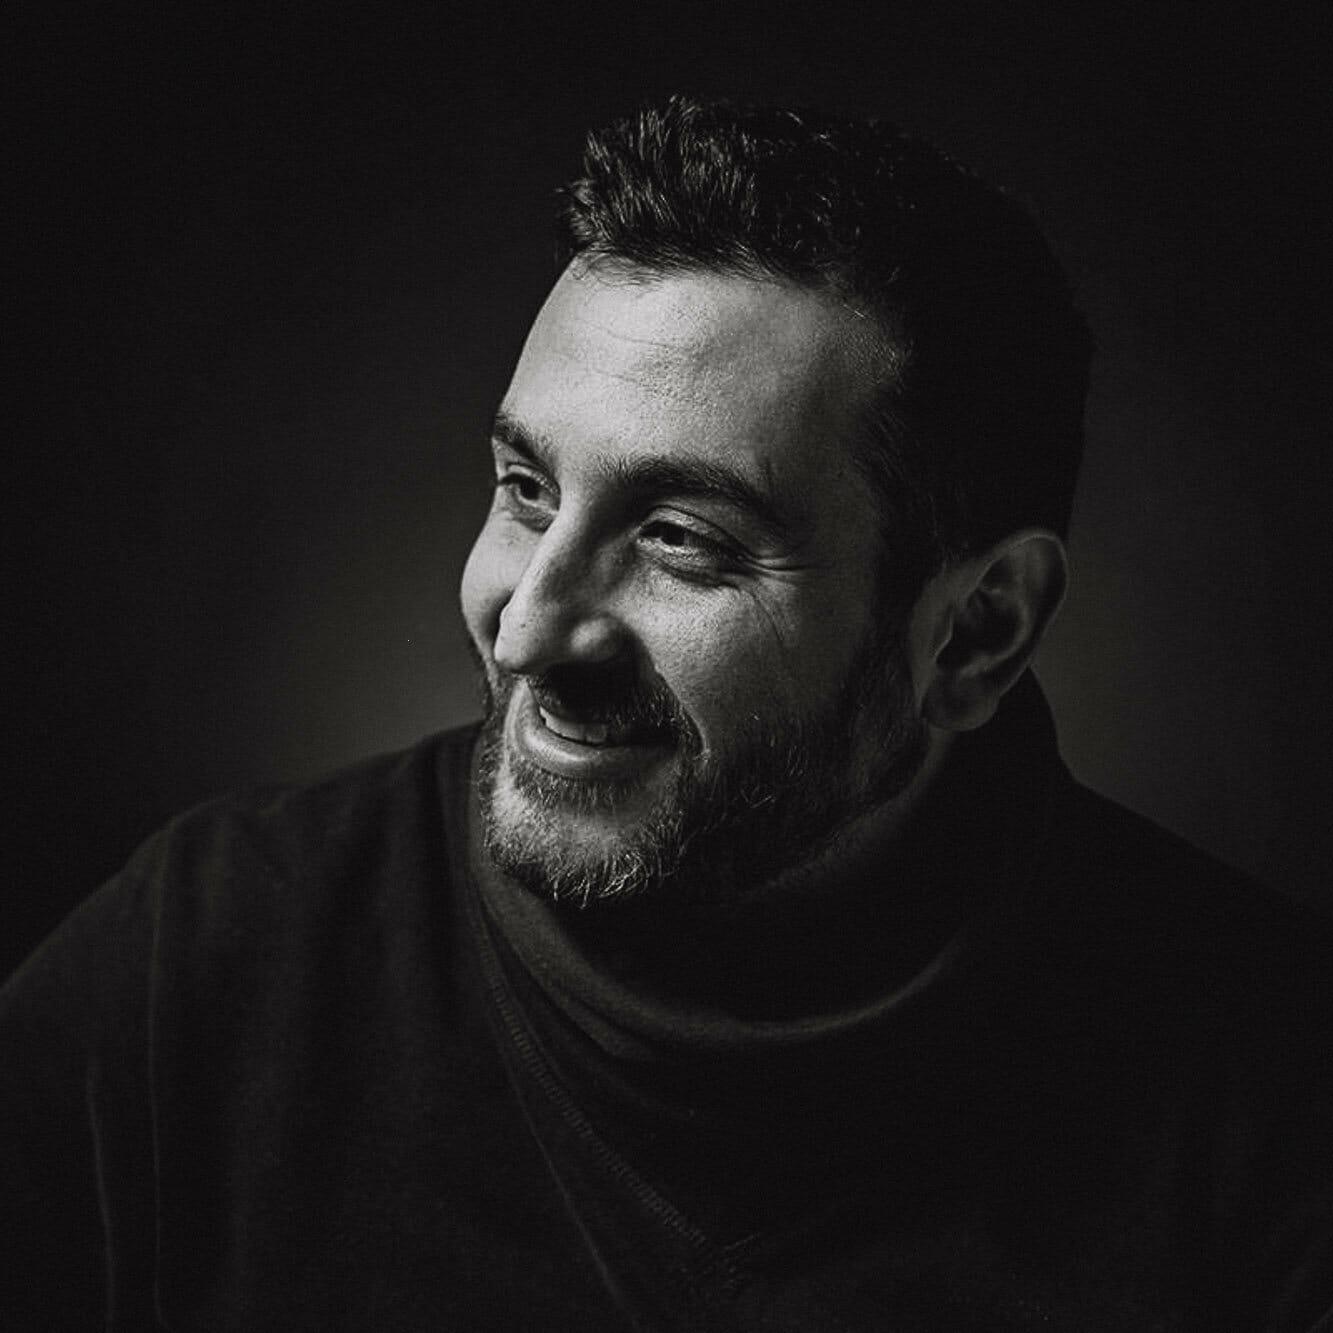 Pietro Moliterni